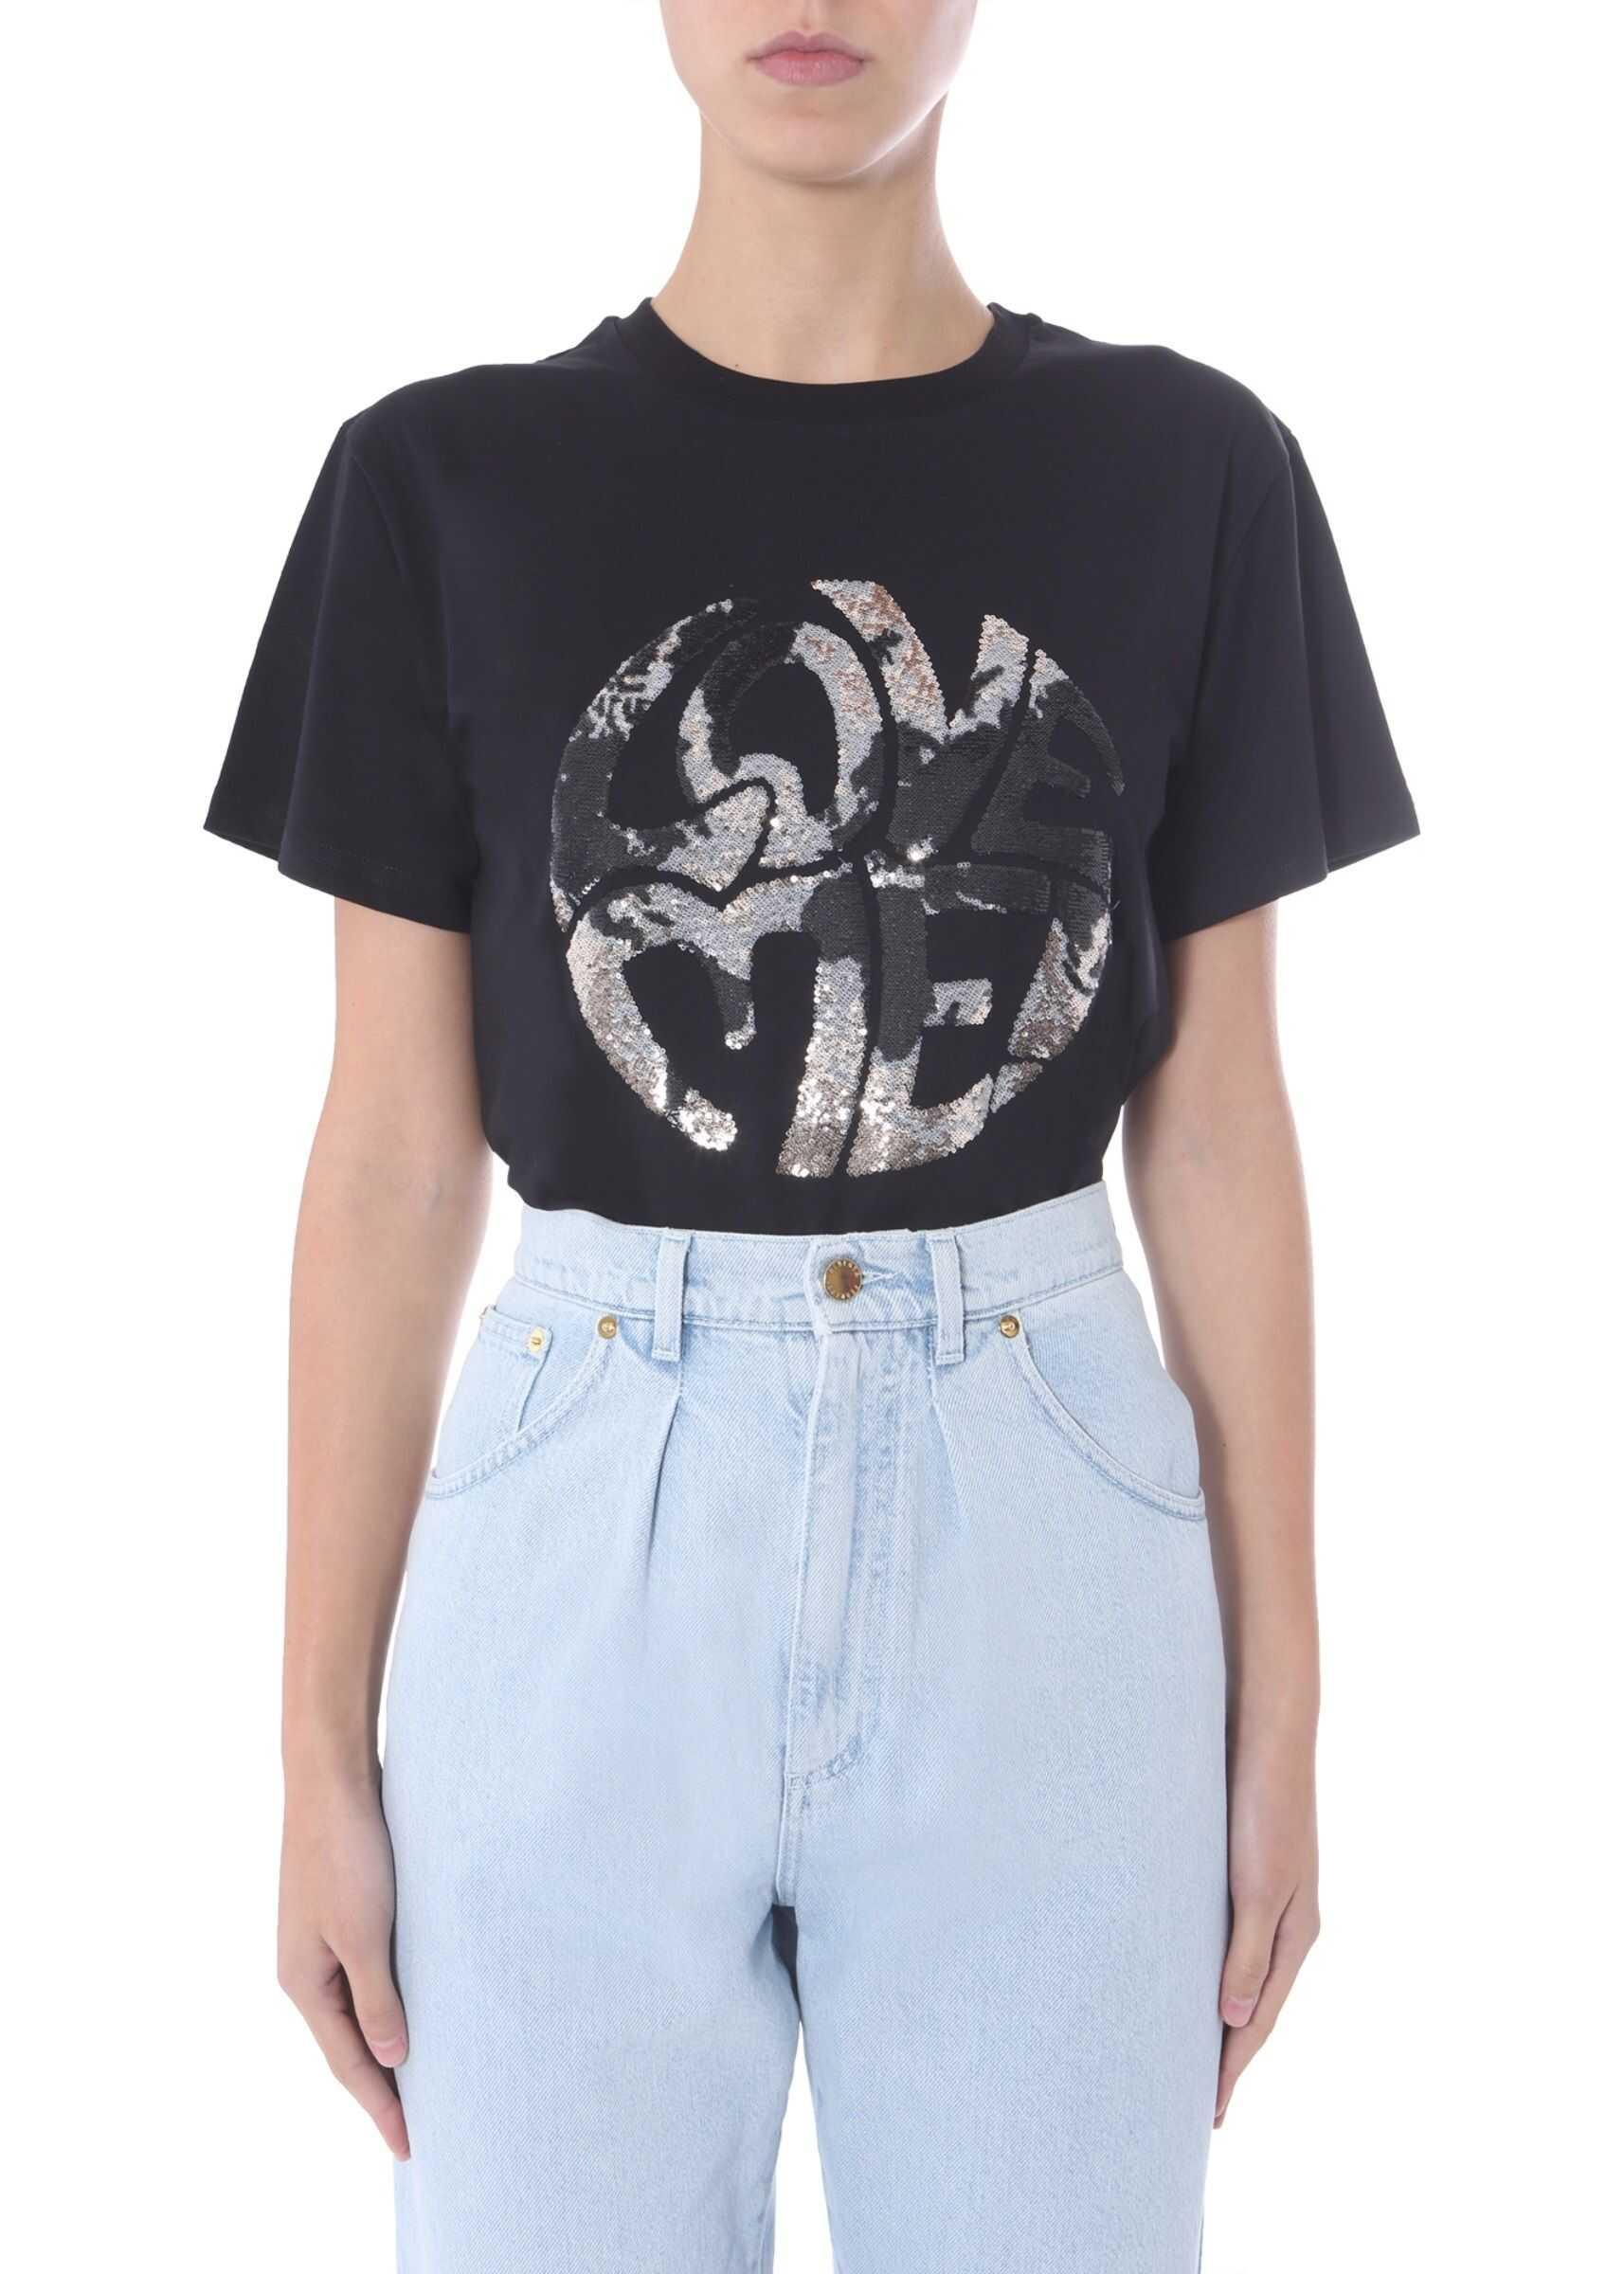 Alberta Ferretti Round Neck T-Shirt BLACK